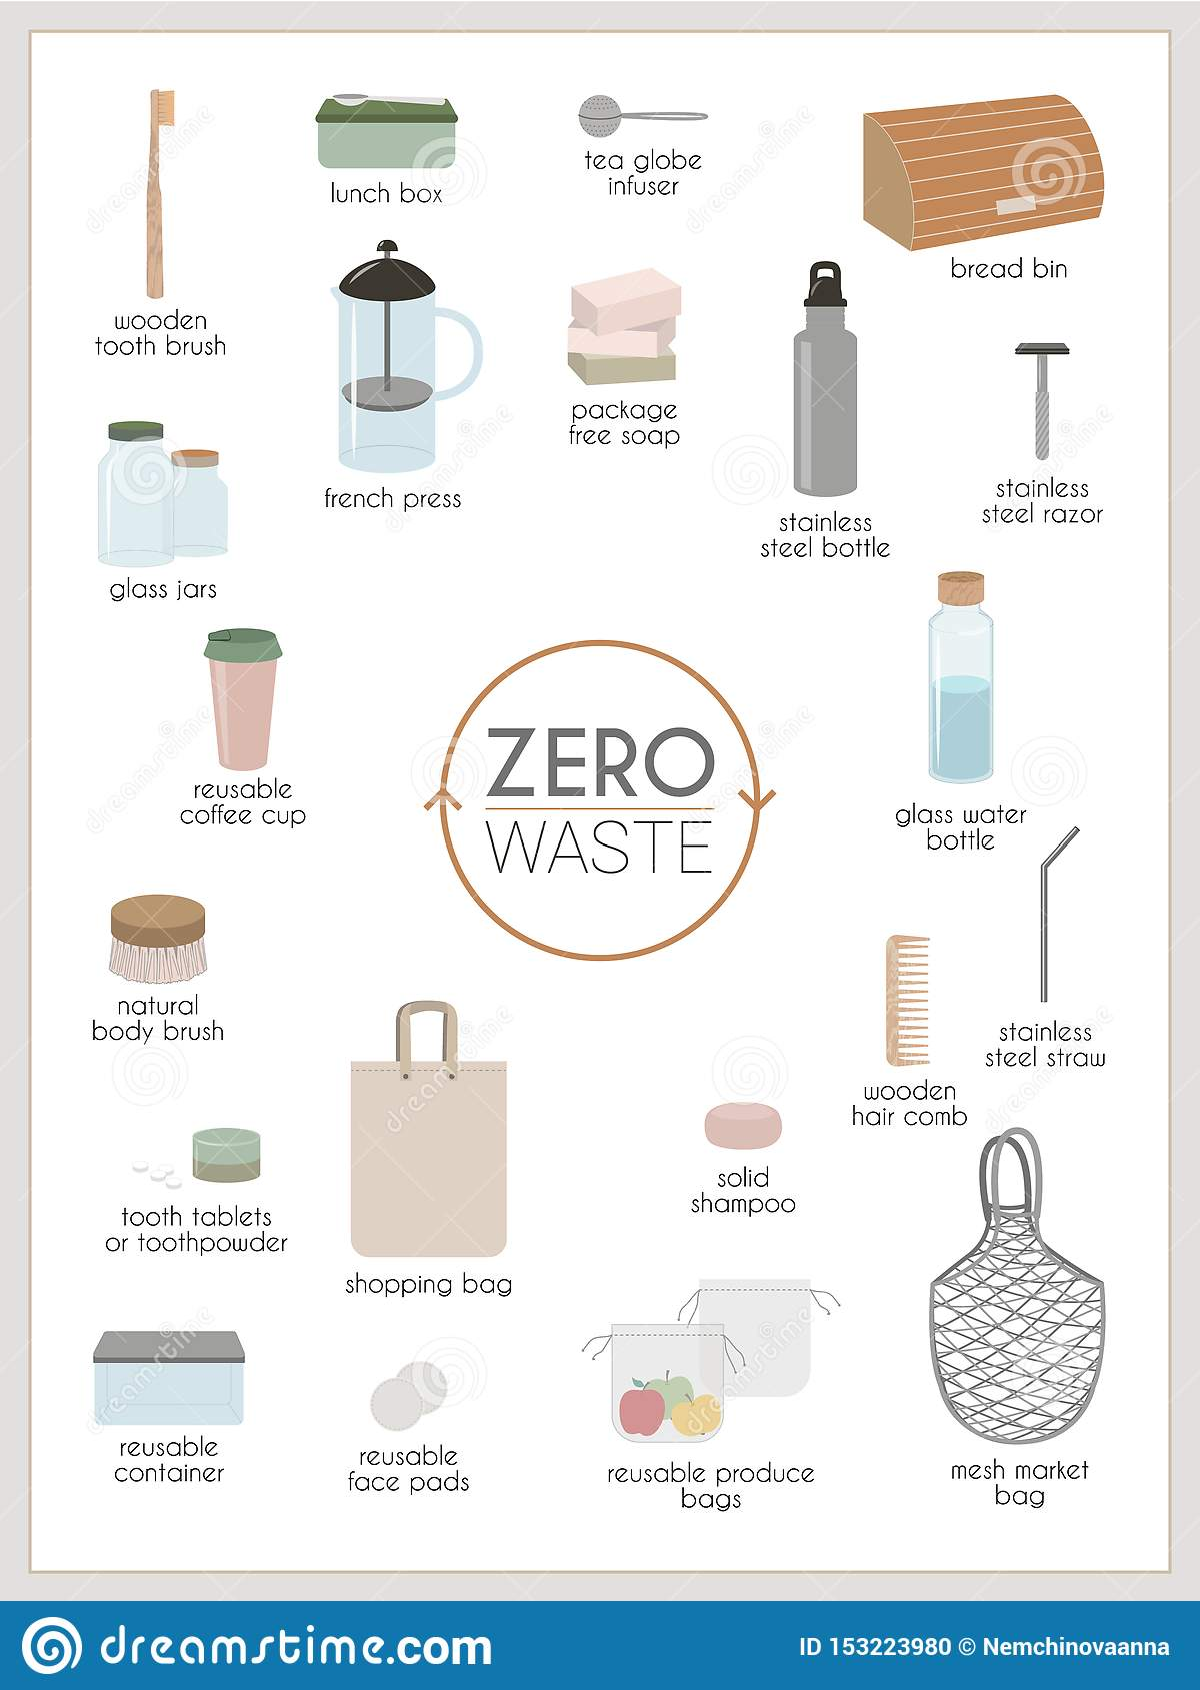 Zero waste logo and infographic